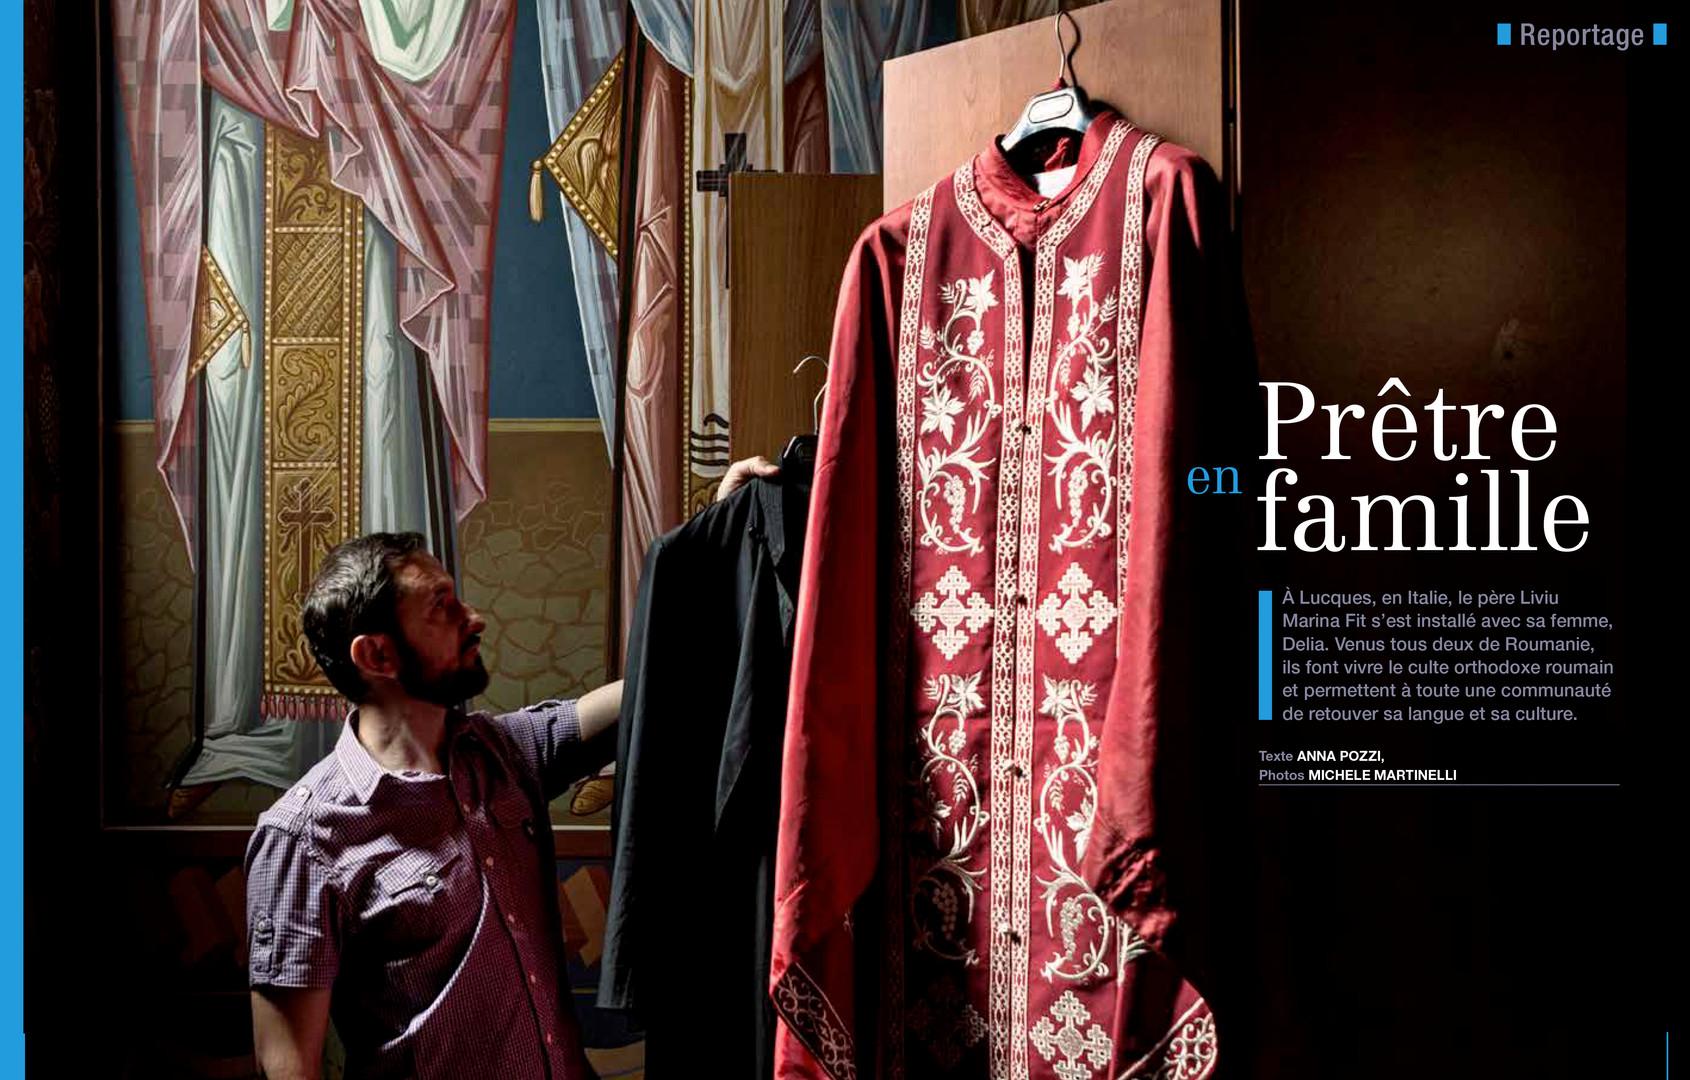 Father Liviu on Prier Magazine